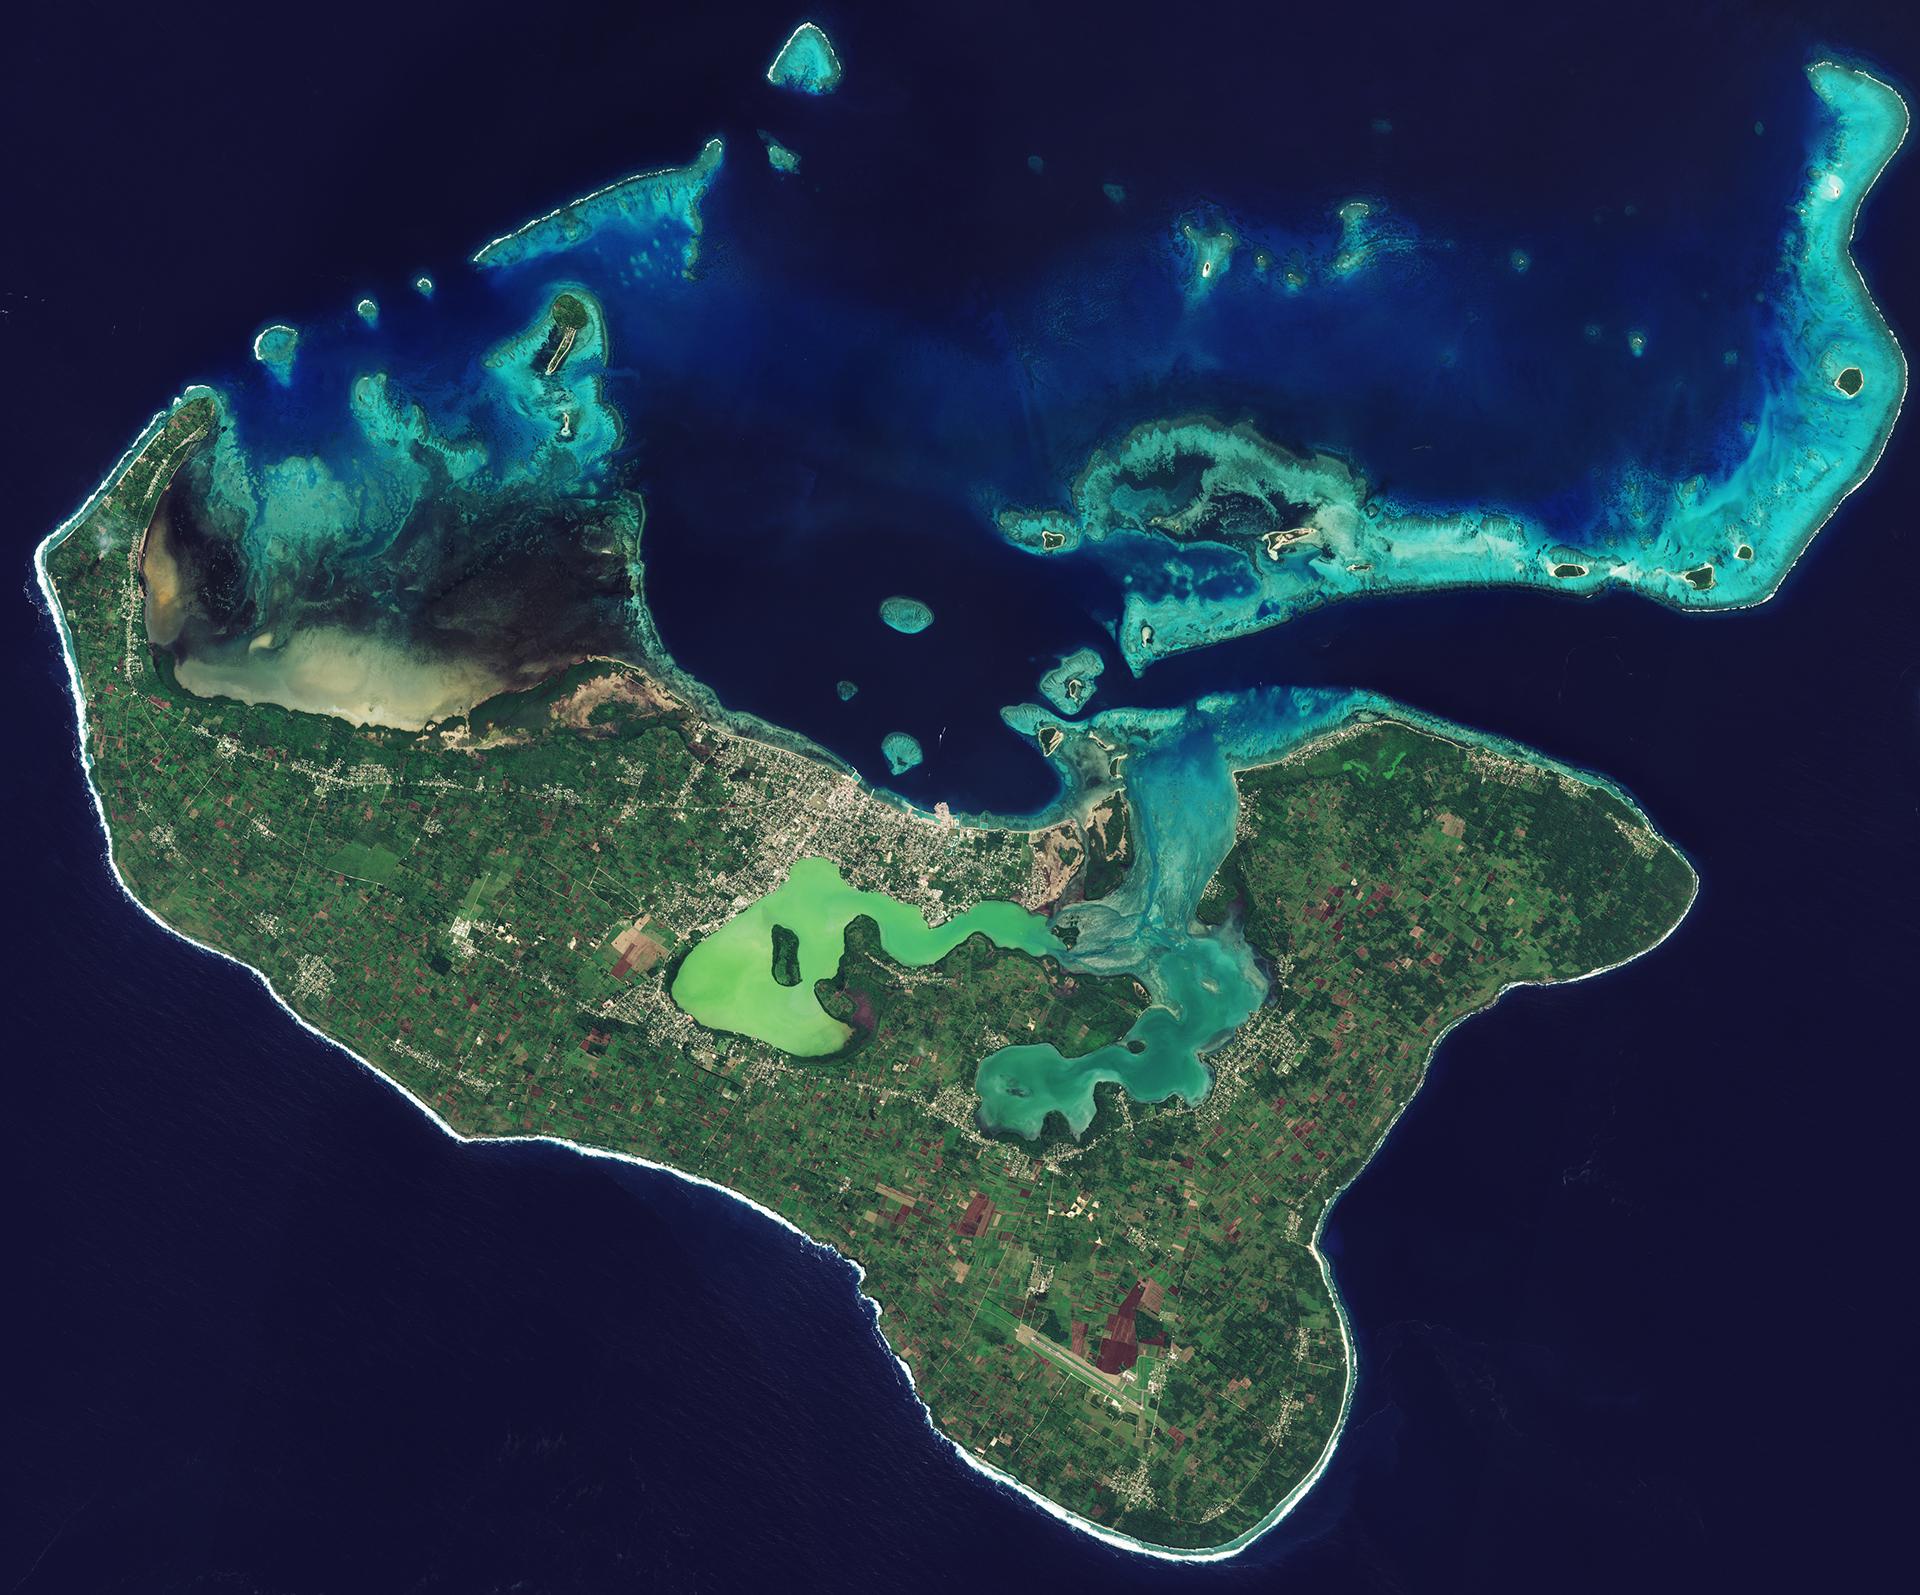 The main Tongan island of Tongapatu as seen from space.